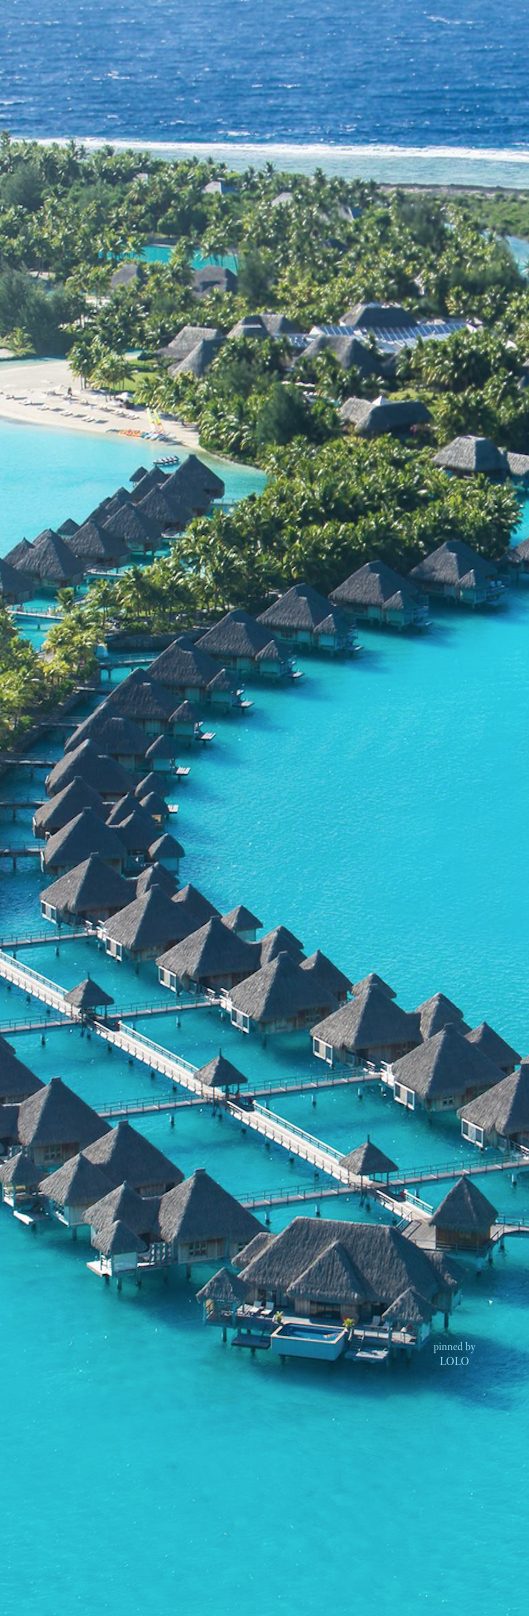 St. Regis Bora Bora   LOLO   DREAM VACATIONS   Vacation